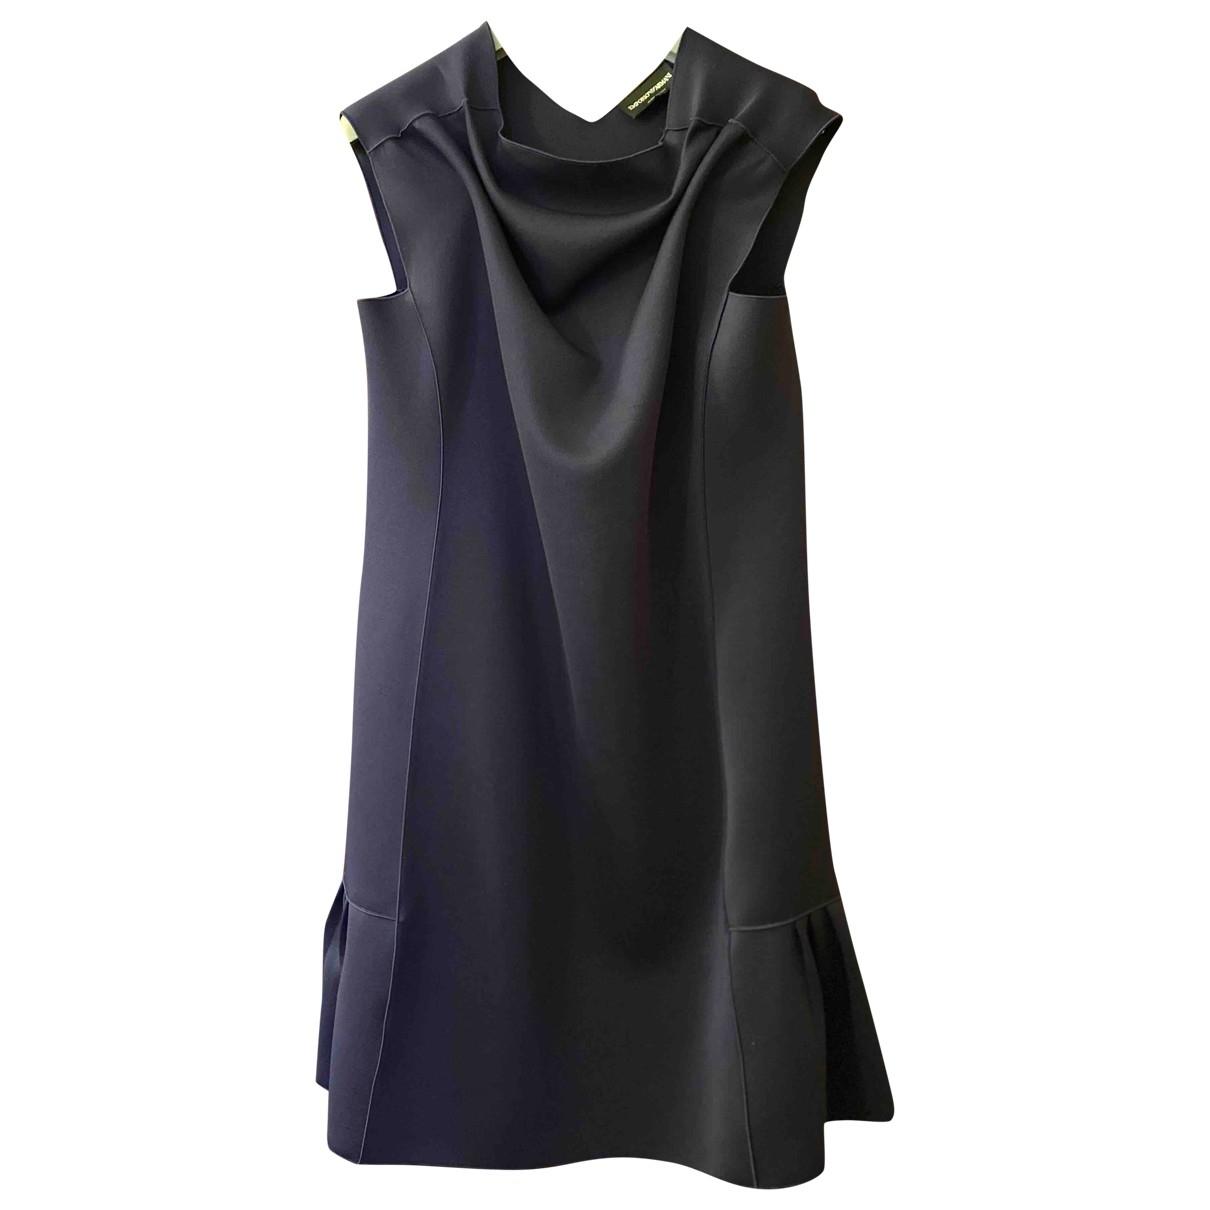 Emporio Armani \N Blue dress for Women 42 IT